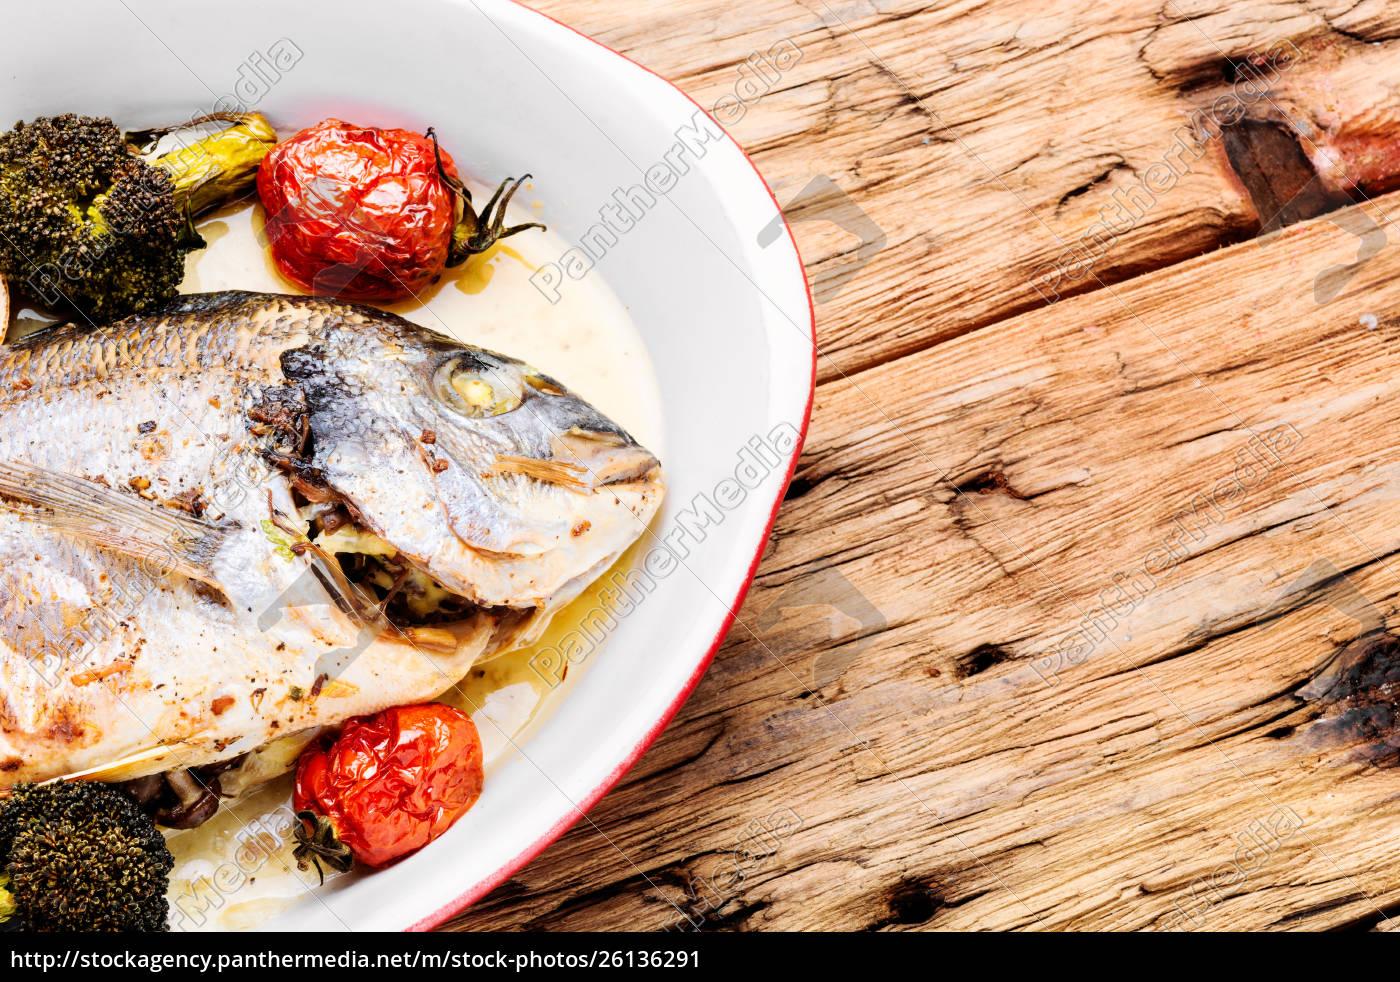 baked, in, oven, sea, fish, dorado - 26136291